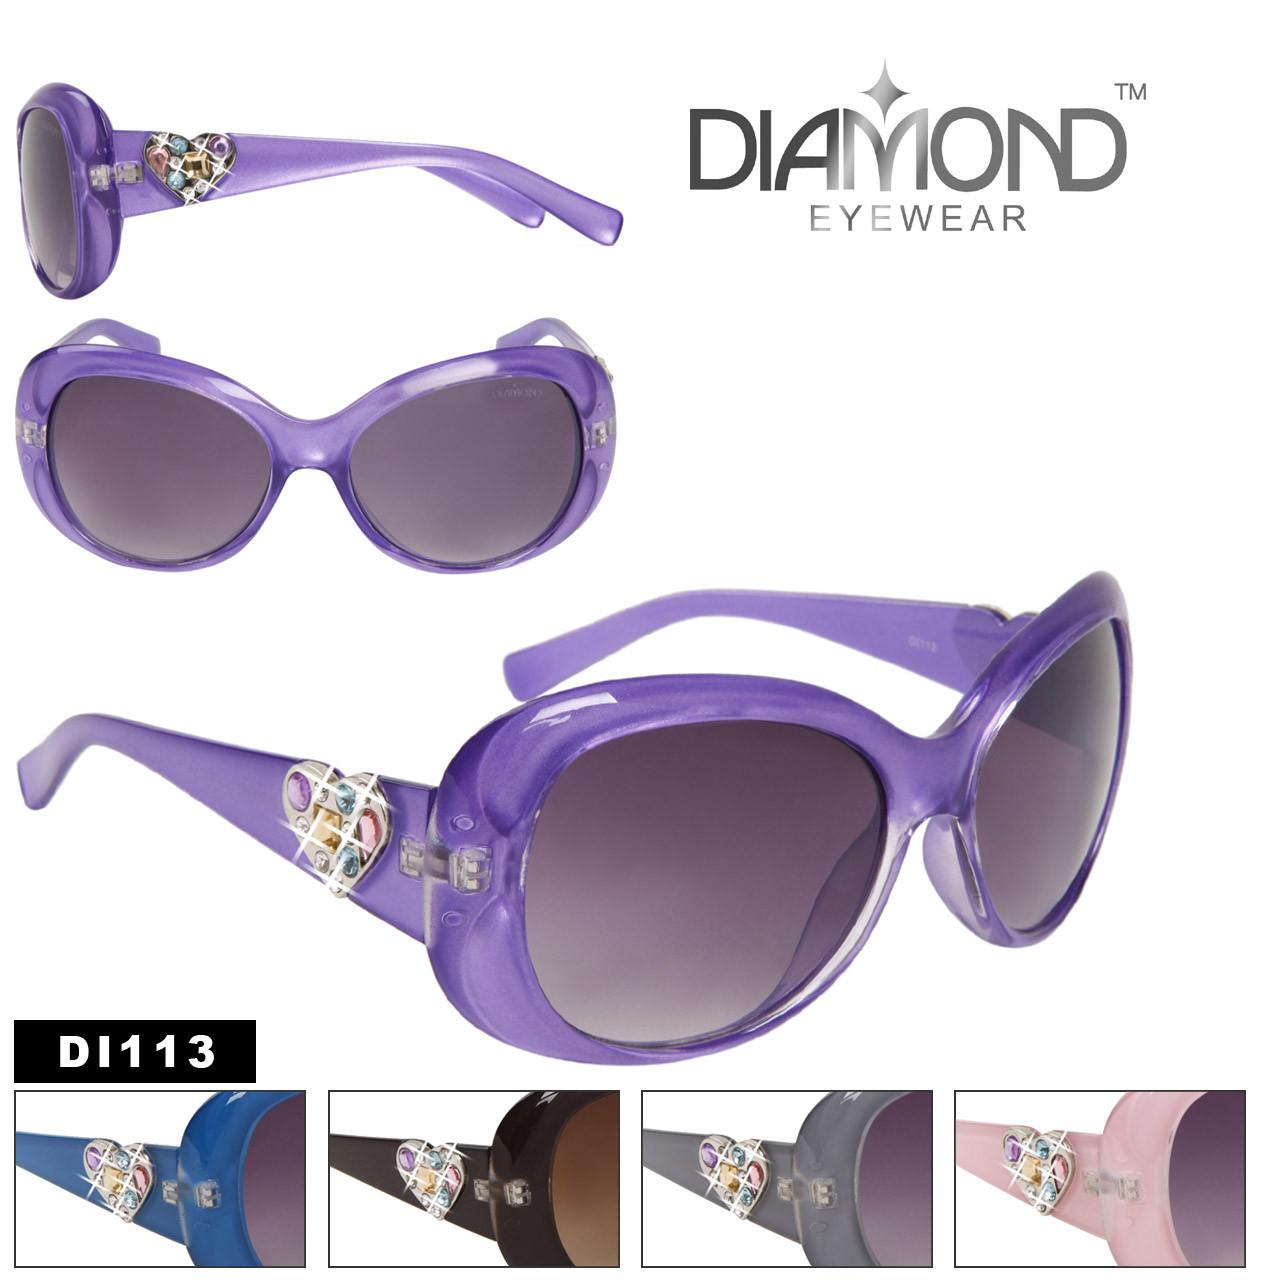 Hearts & Rhinestones Diamond Eyewear Sunglasses DI113